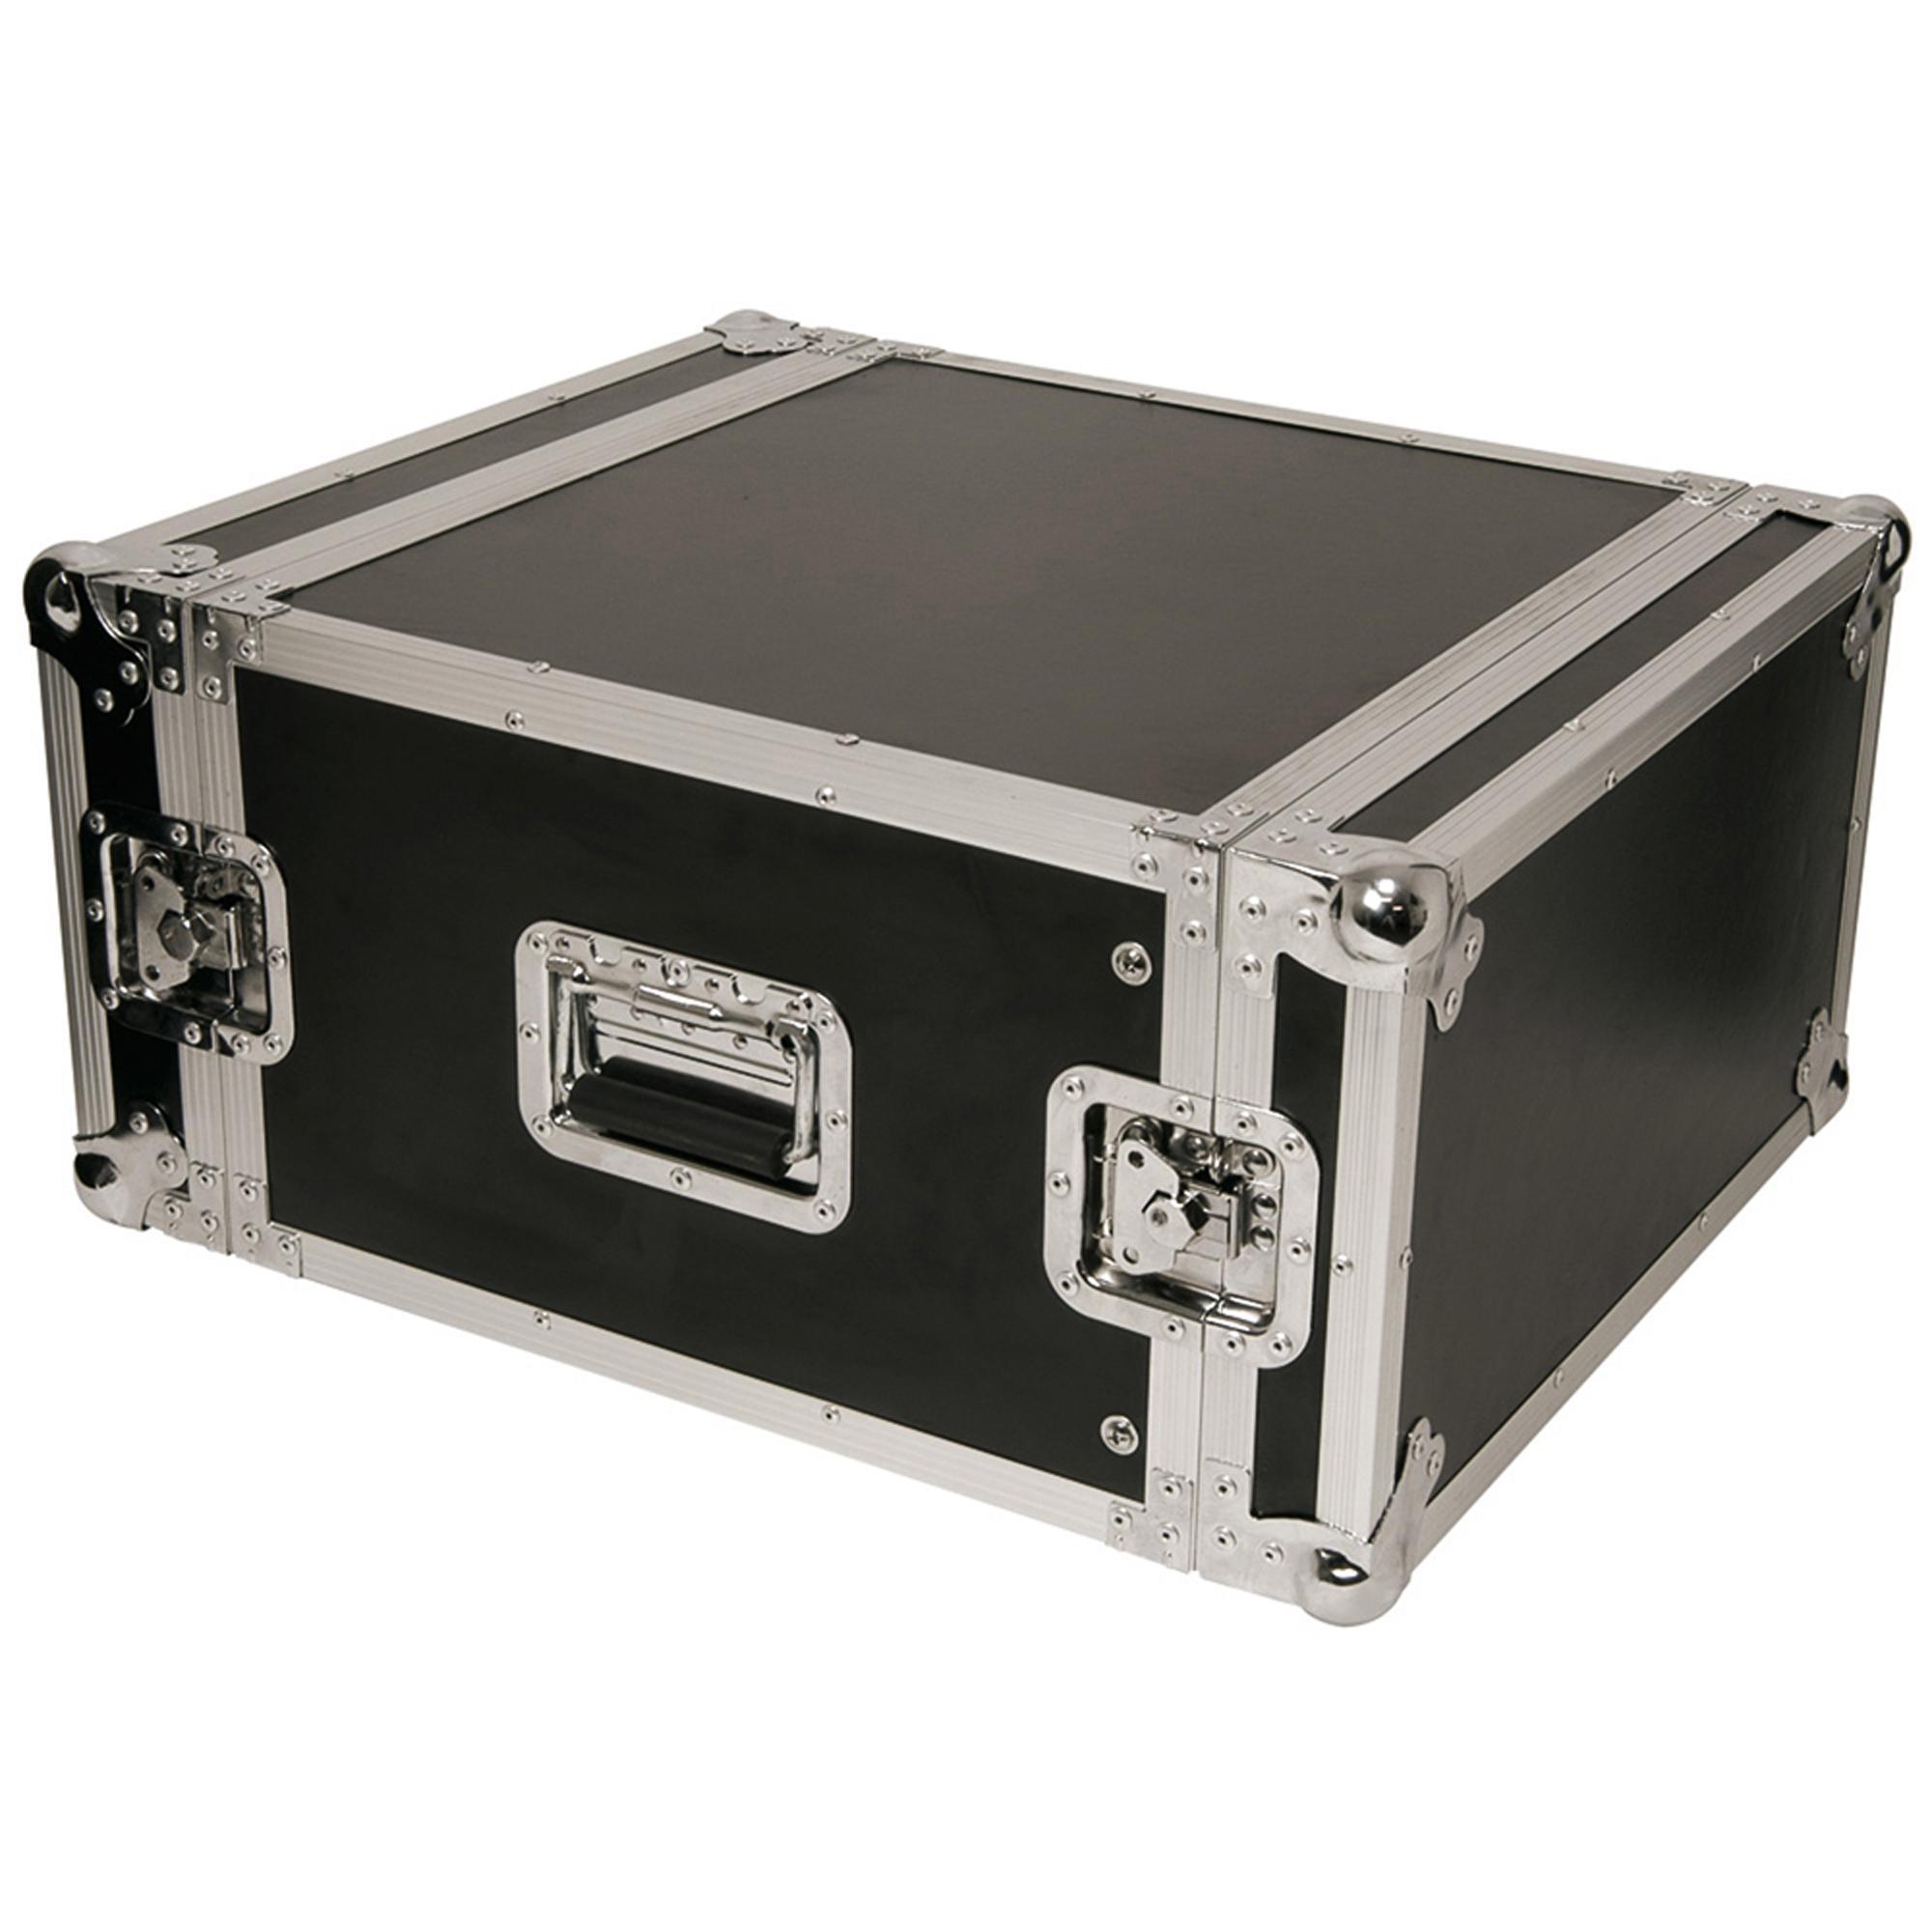 aluminium flightcase fits 4x 19 units mobile dj disco equipment protective case. Black Bedroom Furniture Sets. Home Design Ideas